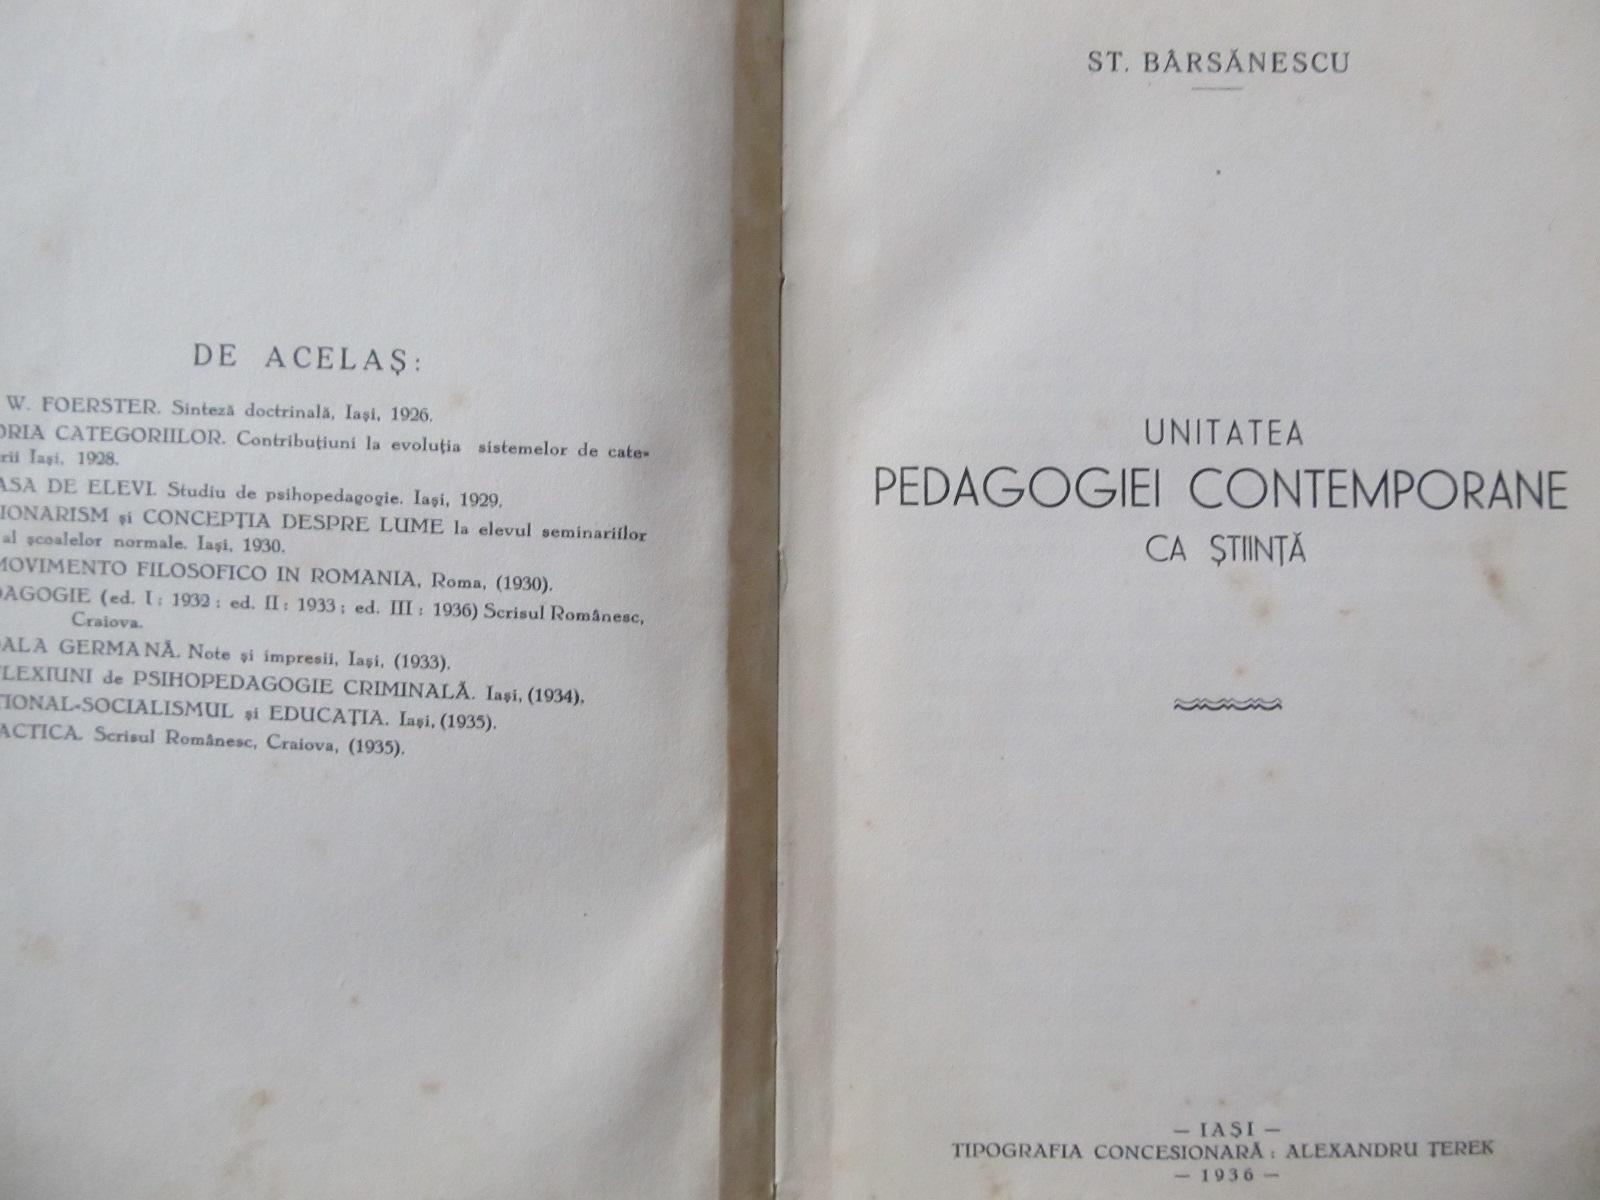 Unitatea pedagogiei contemporane ca stiinta , 1936 - St. Barsanescu | Detalii carte